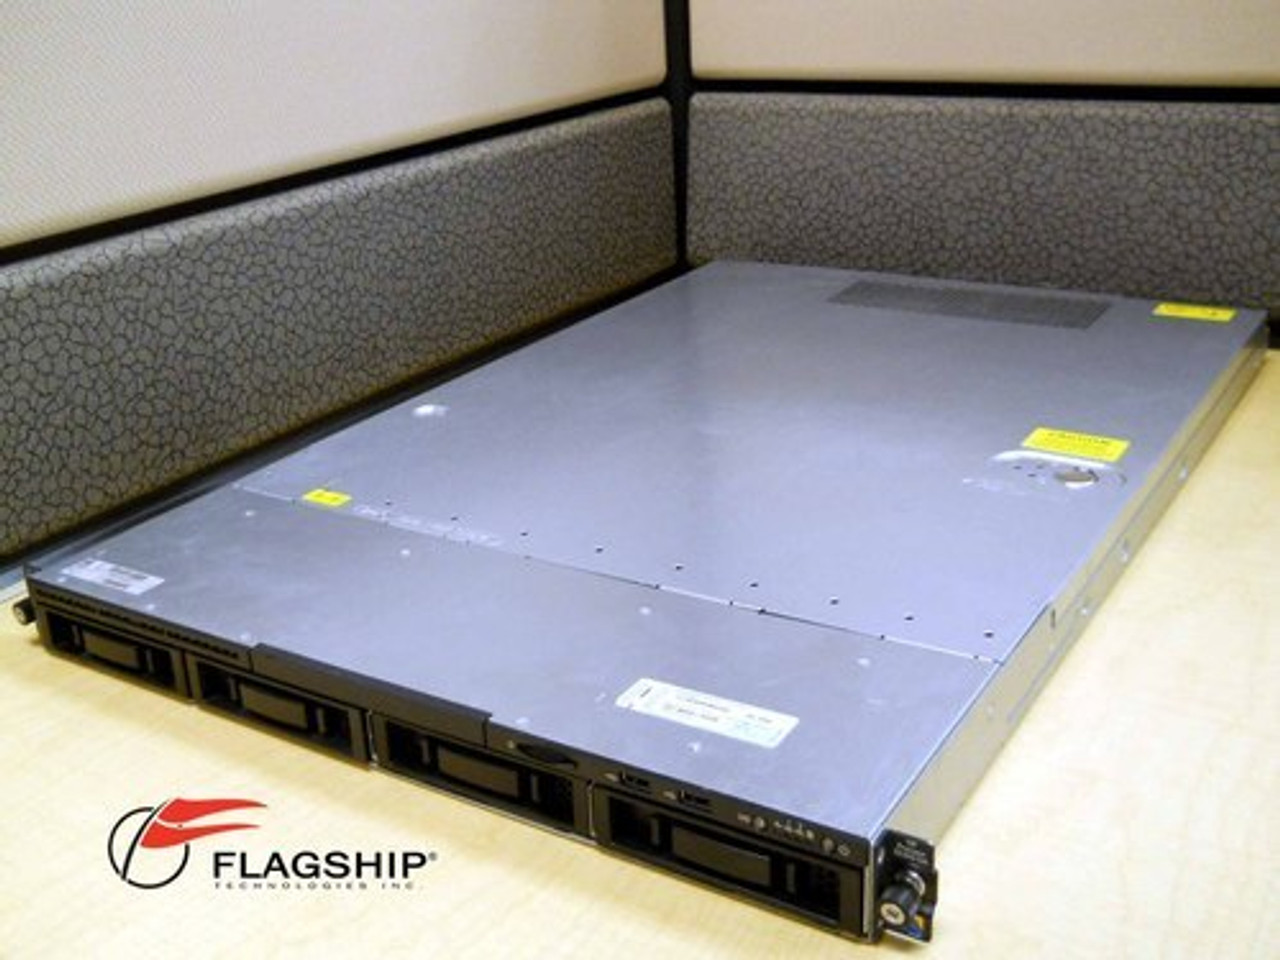 HP Proliant DL160 Servers